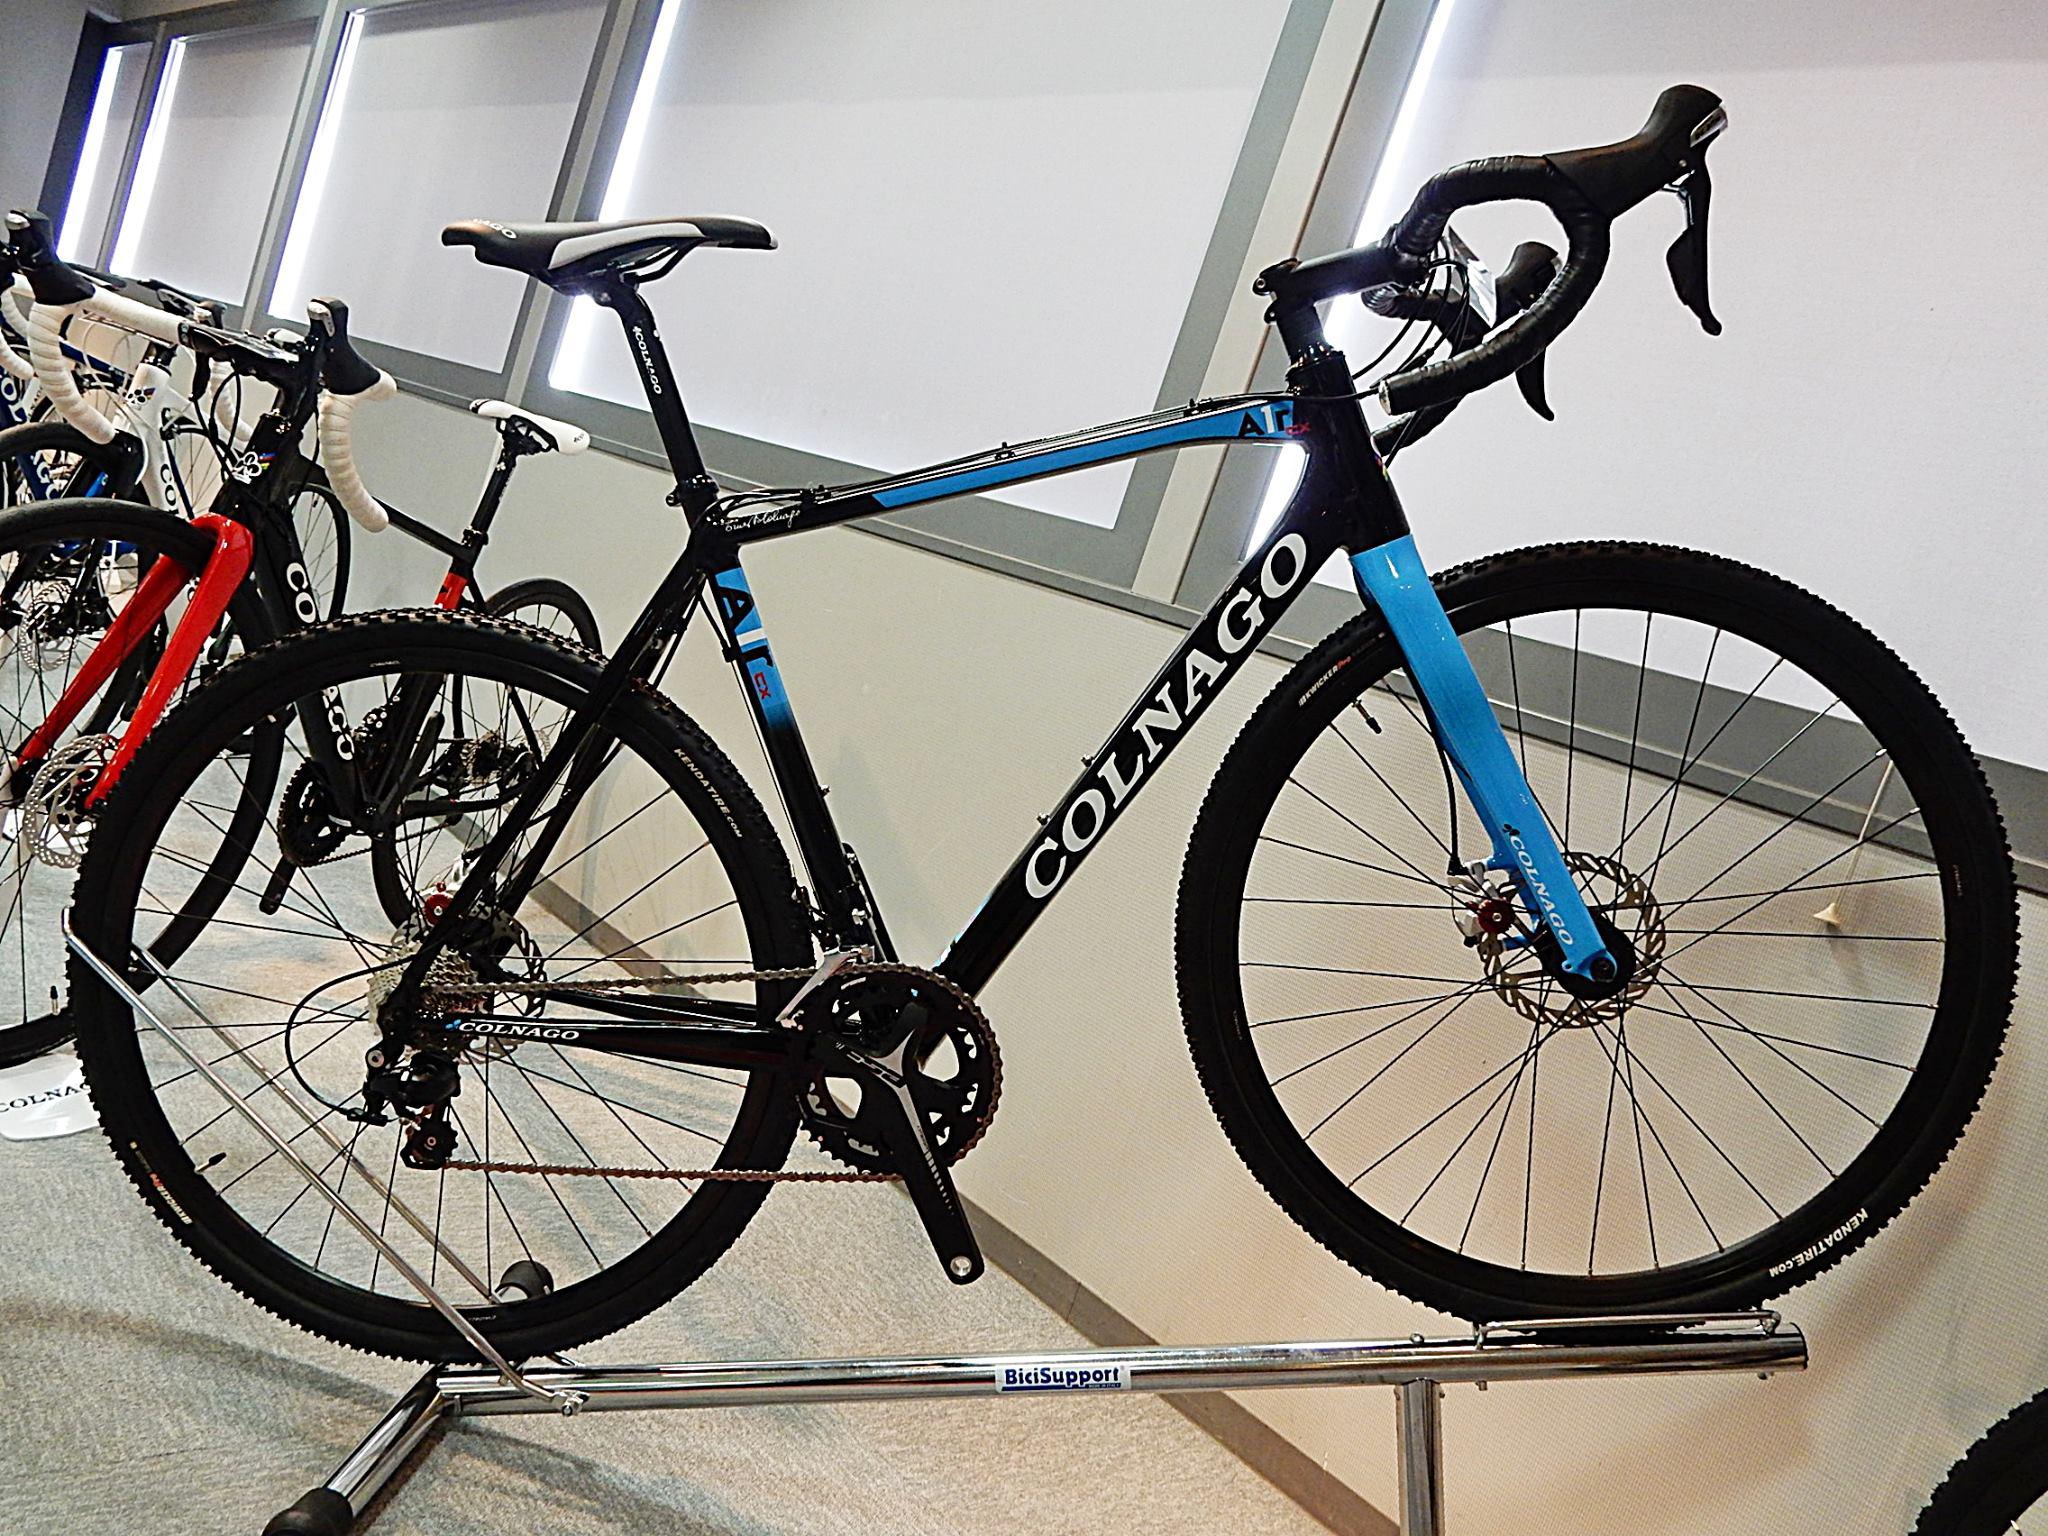 2017 COLNAGO colnago コルナゴ A1-r a1-r A1-R CX cx 105 アルミ シクロクロス 完成車 オフロード レース サイクリング 広島県福山市 FINE fine ファイン